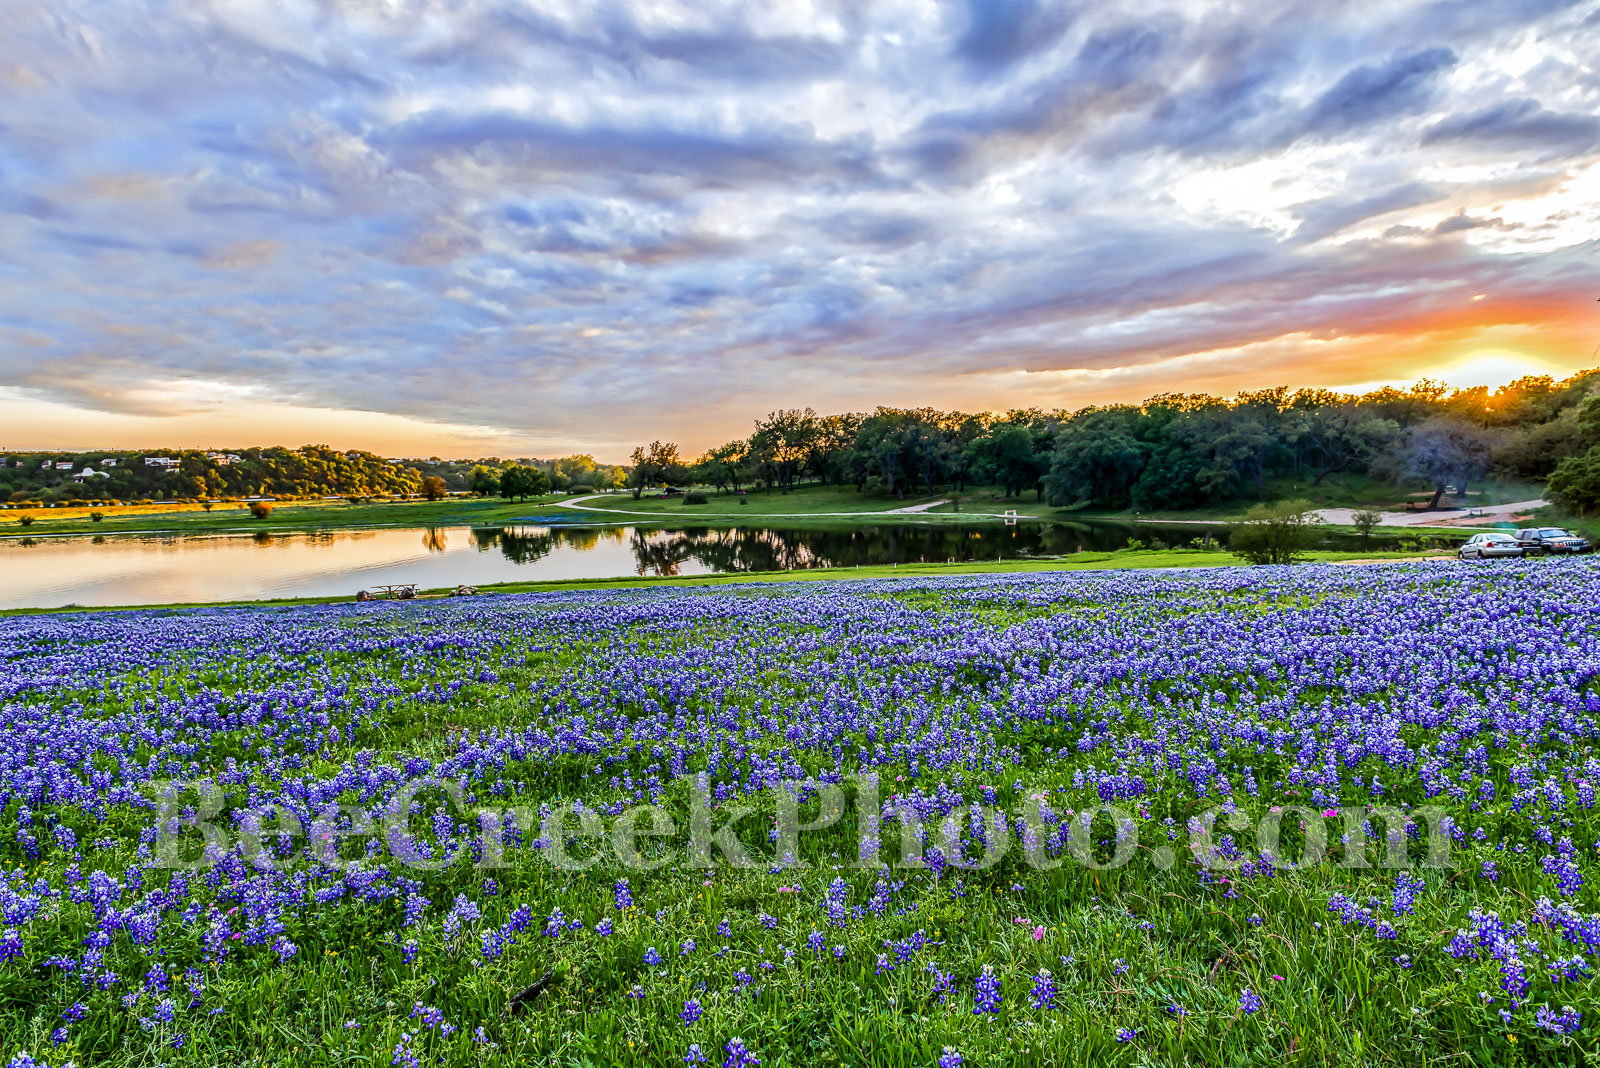 Bluebonnets, bluebonnet, park, water, reflections, colors, oranges, pinks, reds, sky, colorful, blue bonnets, wildflowers, wildflower, Colorado River, landscapes, landscape, water, Texas flowers, Texa, photo